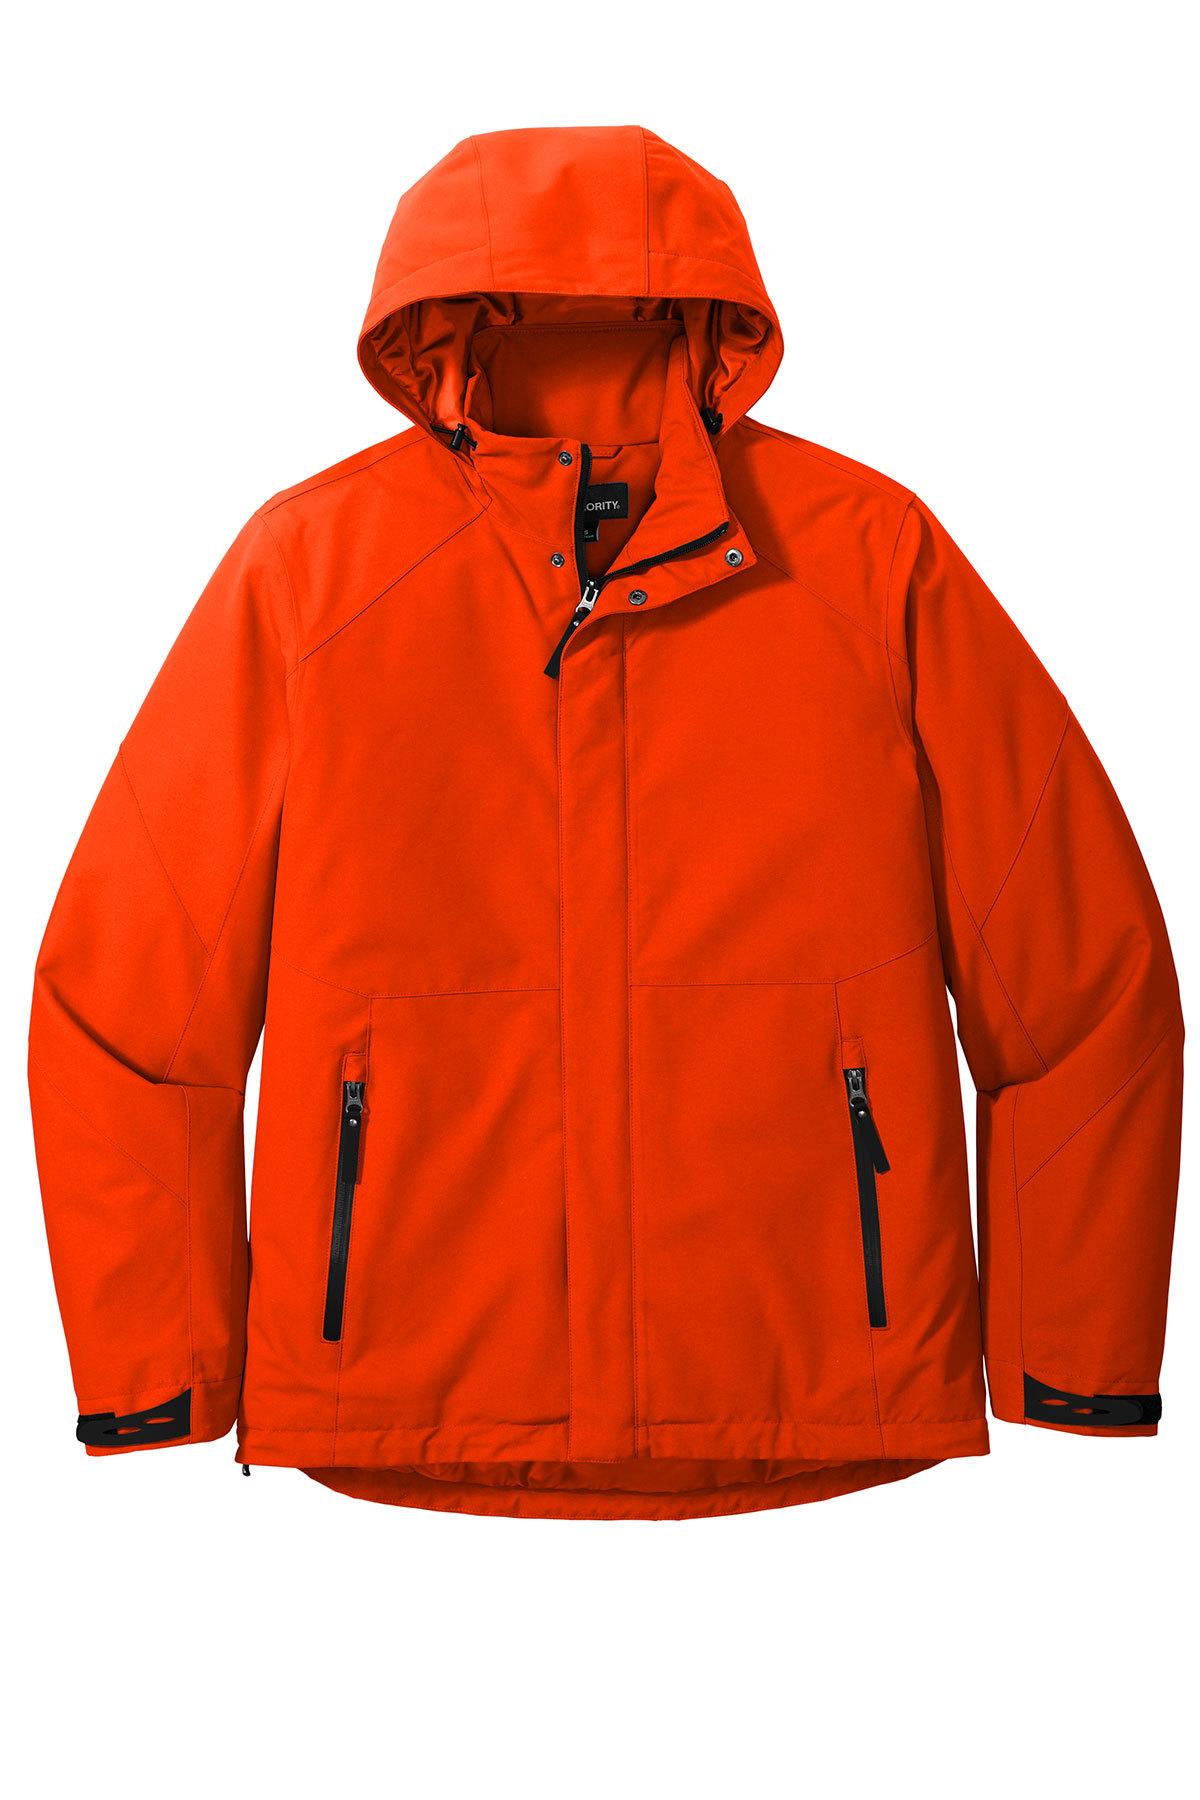 Port Authority Ladies Insulated Waterproof Tech Jacket